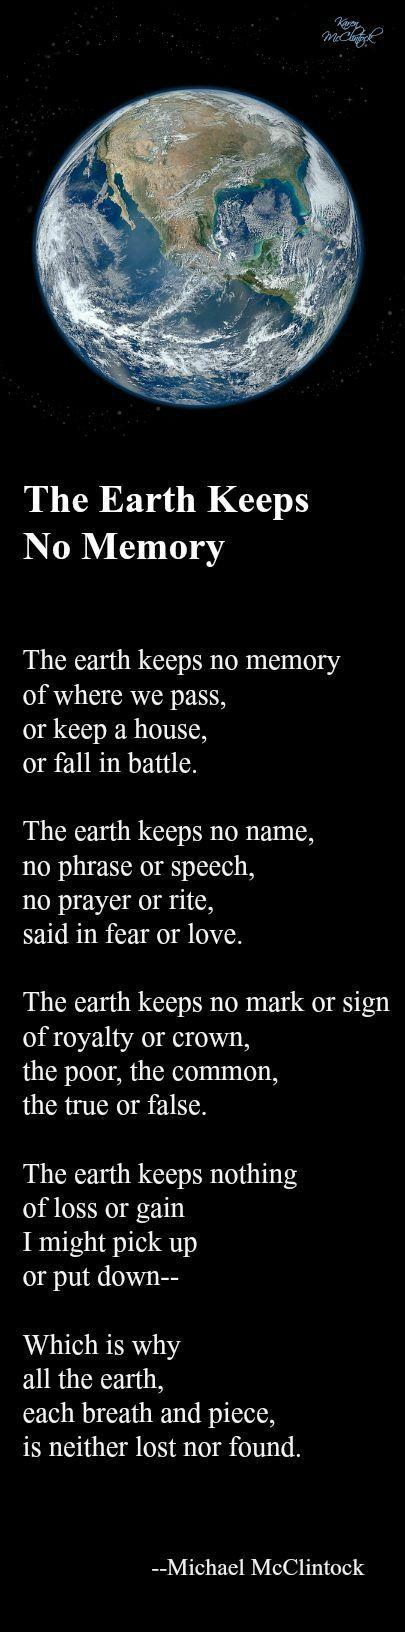 Poem: The Earth Keeps No Memory -- by Michael McClintock.